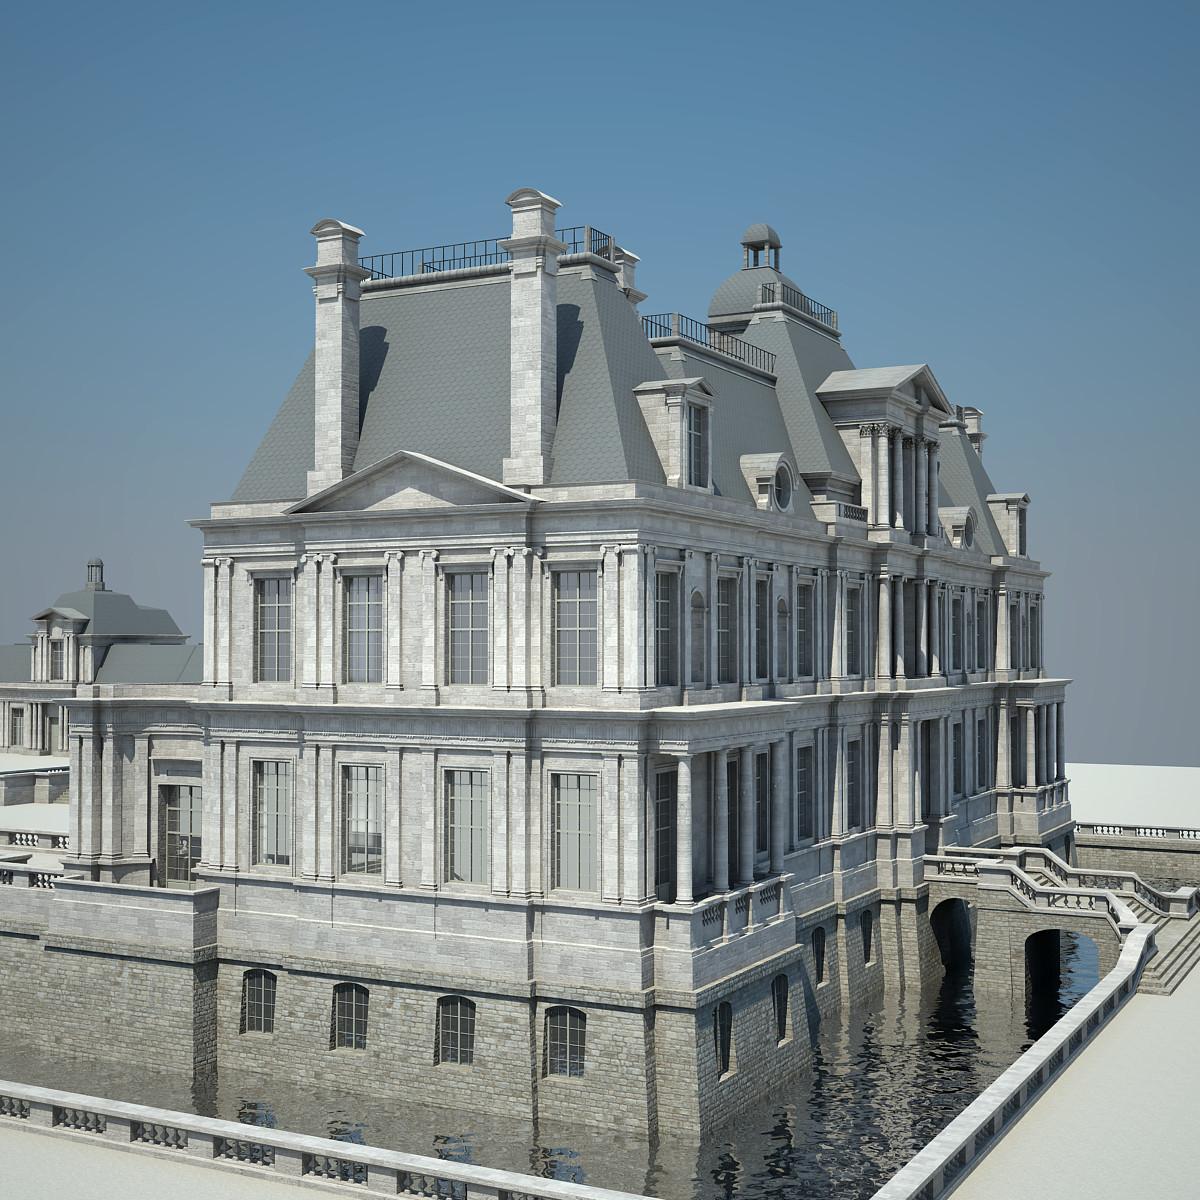 Chateau_16 - Cópia.png